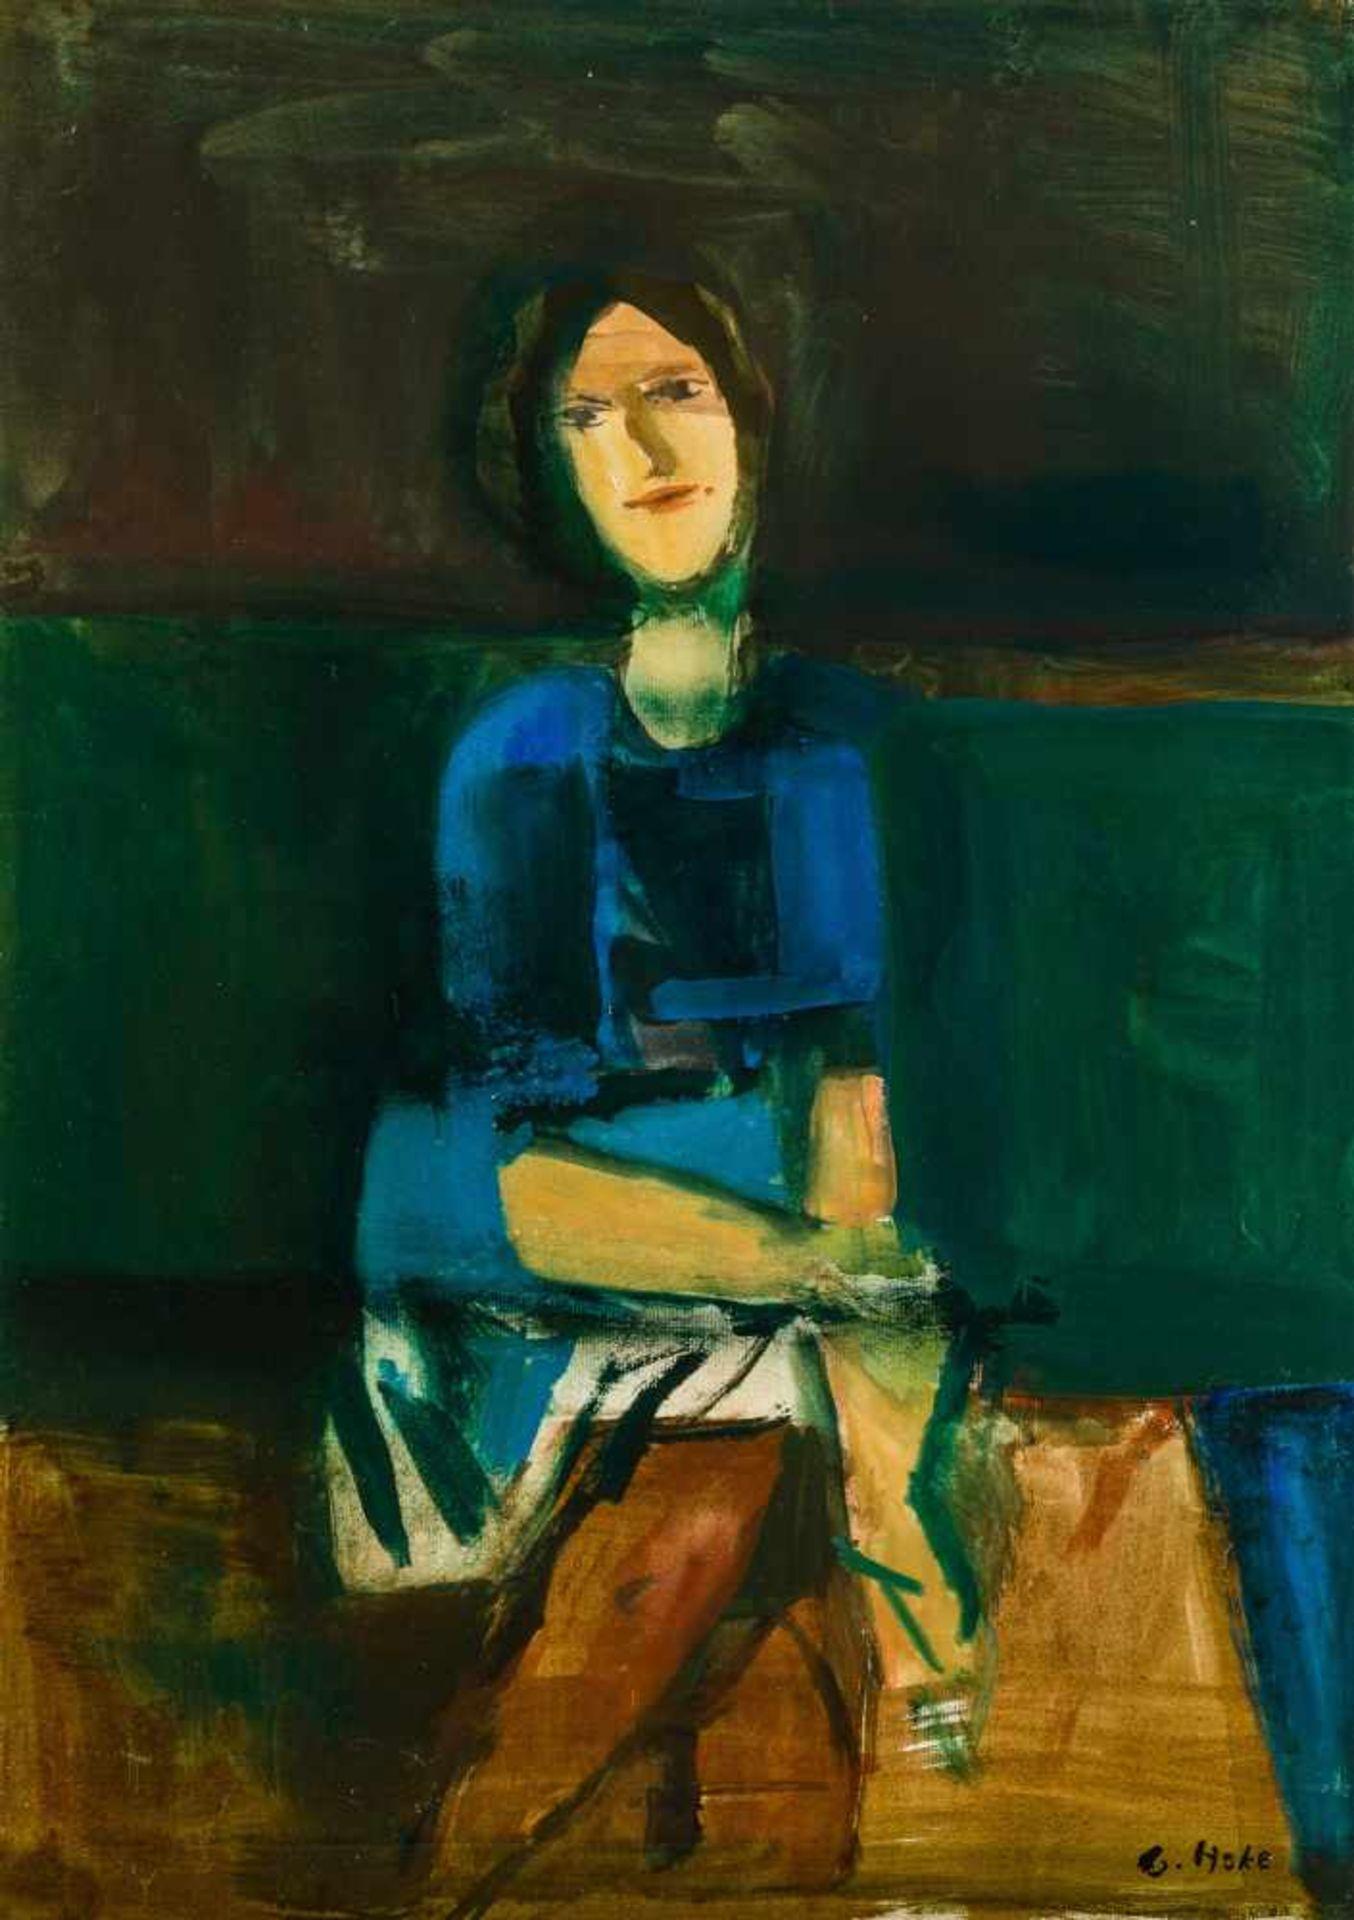 Los 50 - Giselbert Hoke Warnsdorf 1927 - 2015 Klagenfurt Sitzende Frau Öl auf Papier 69 x 48 cm 1970er